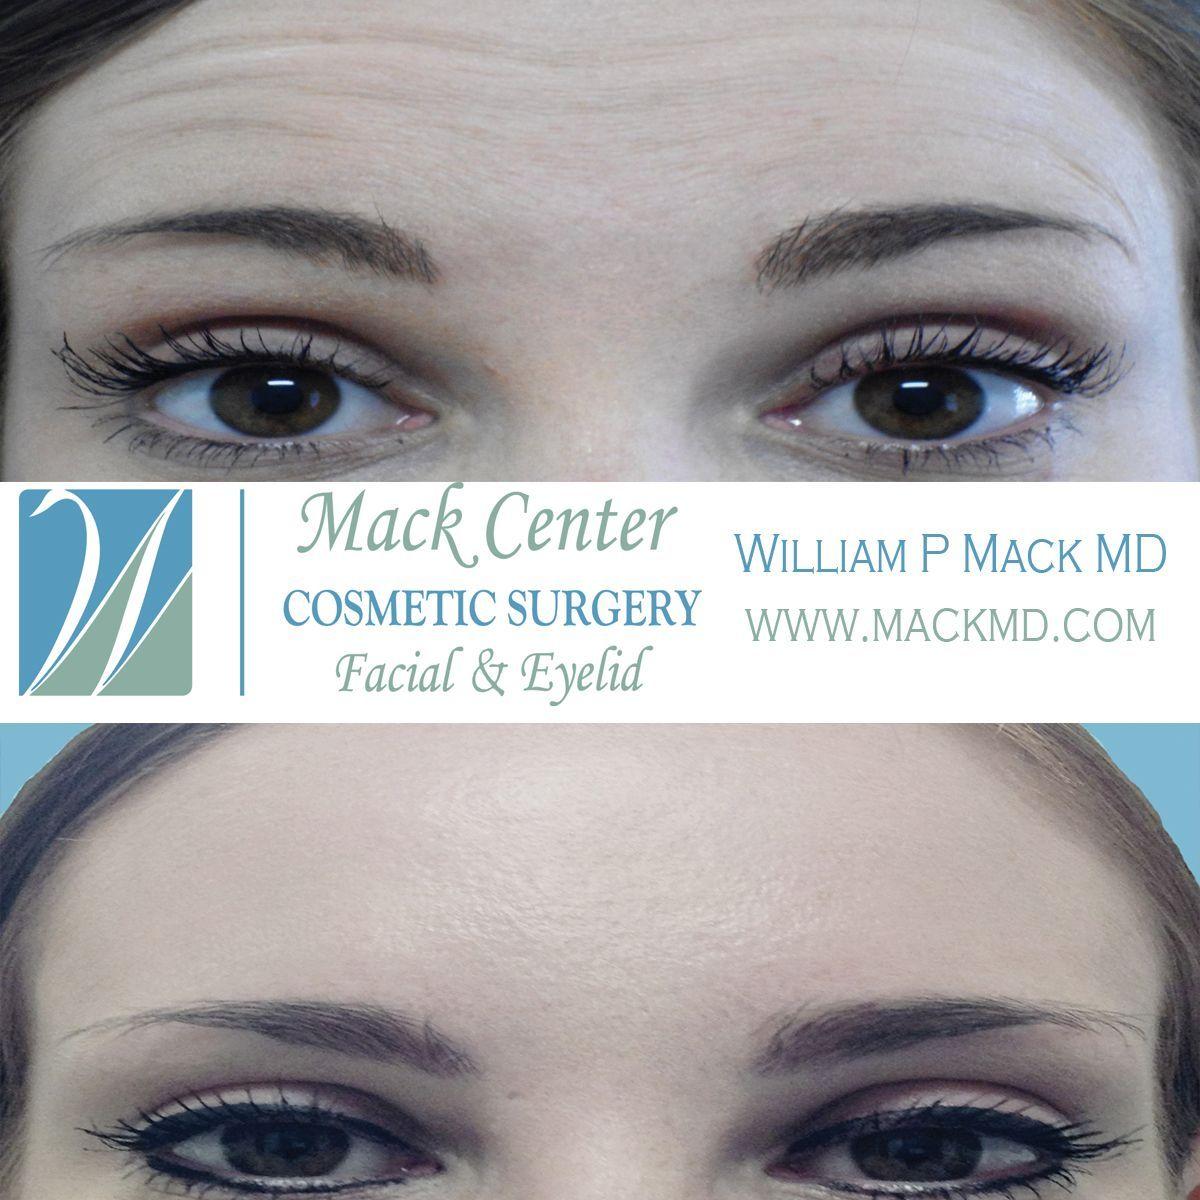 BOTOX Cosmetic treatments in Tampa Bay, Florida. www